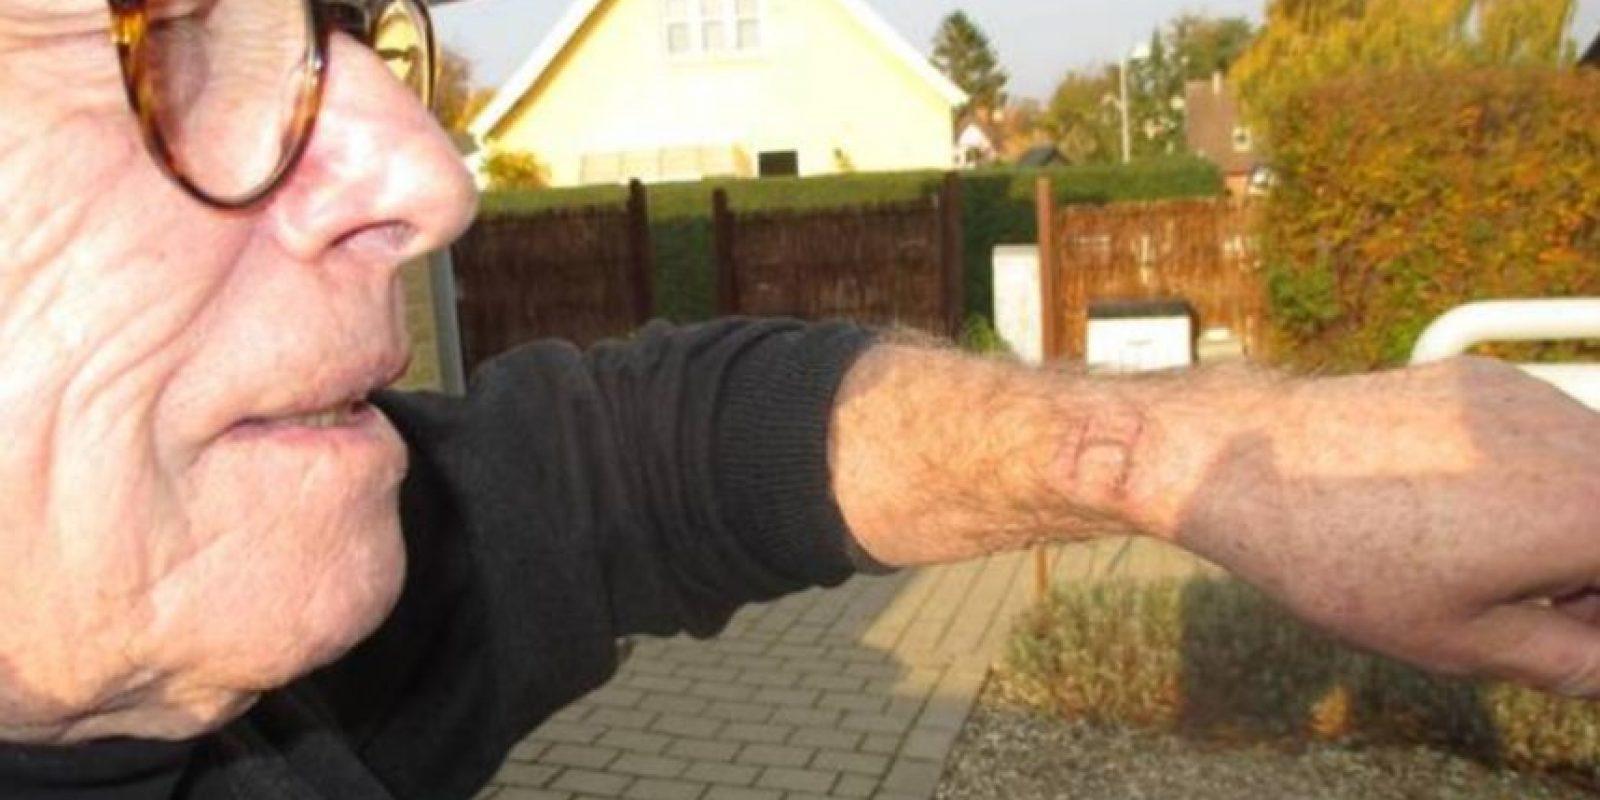 Jørgen Mouritzen dice que su Apple Watch le causó severas quemaduras. Foto:vía ekstrabladet.dk